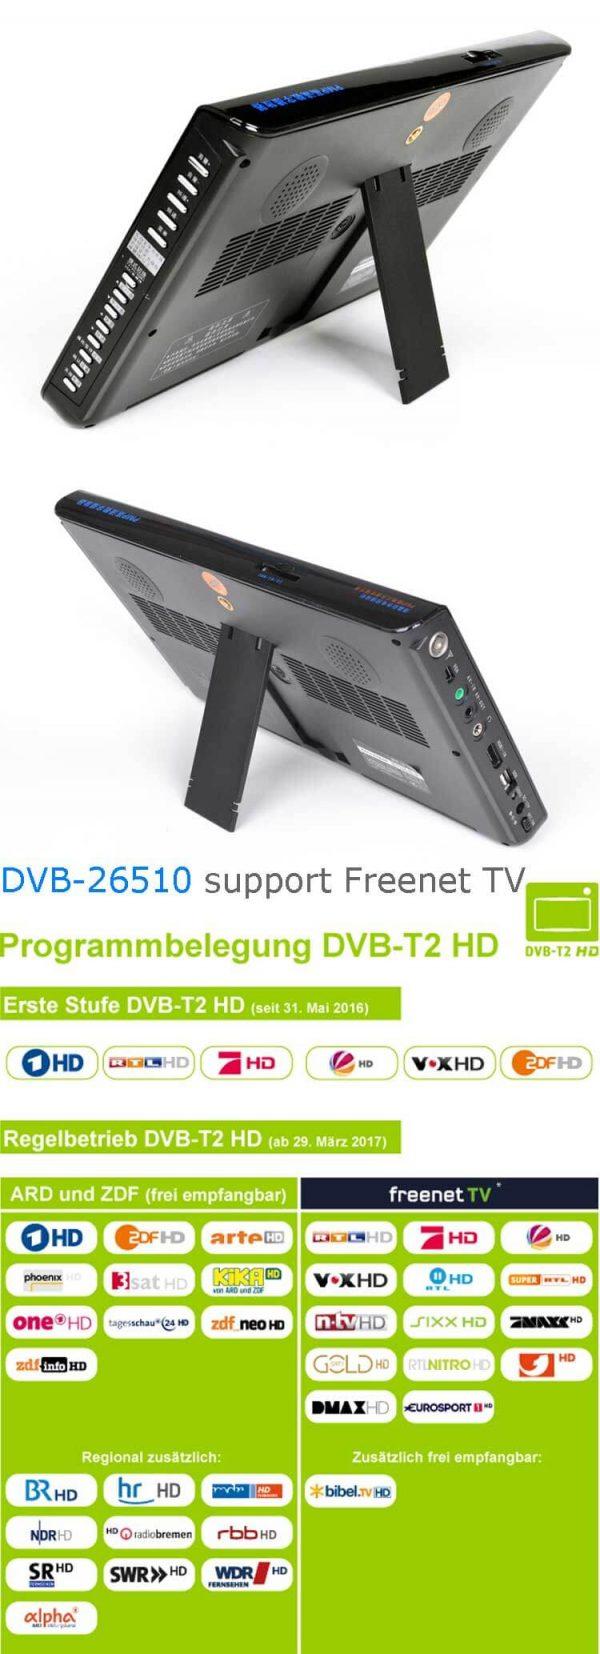 10 DVB-T2 H265 HEVC AC3 Codec Portable TV PVR Multimedia Player Analog kitchen bedroom car DVB-T26510 2 -